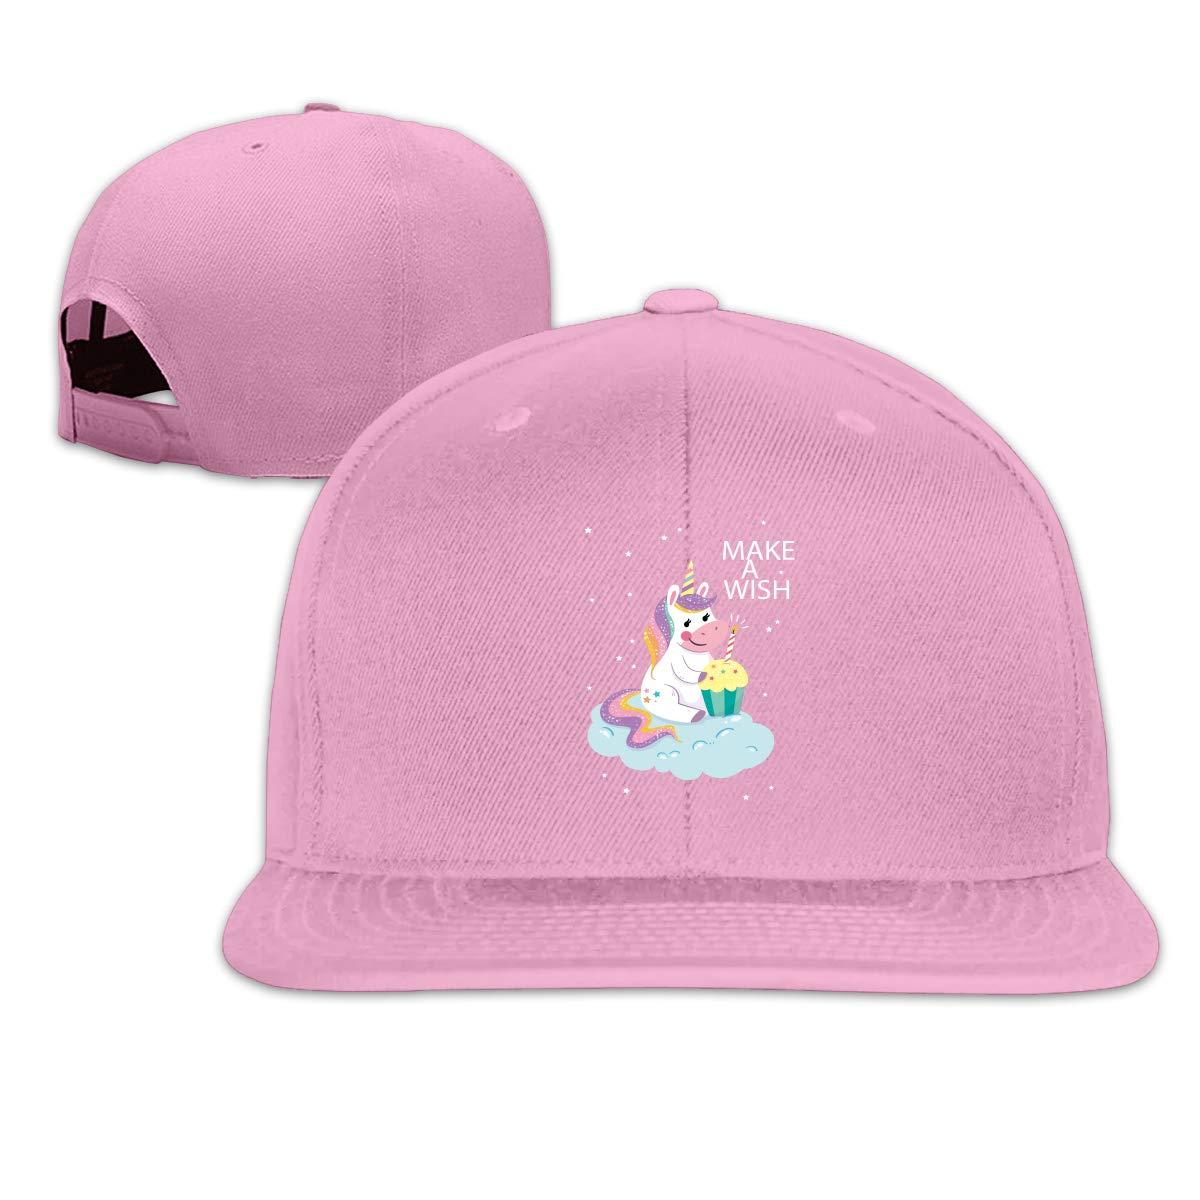 Wishing Unicorn Flat Brim Baseball Cap Adjustable Snapback Trucker Hat Caps Hip Hop Hat